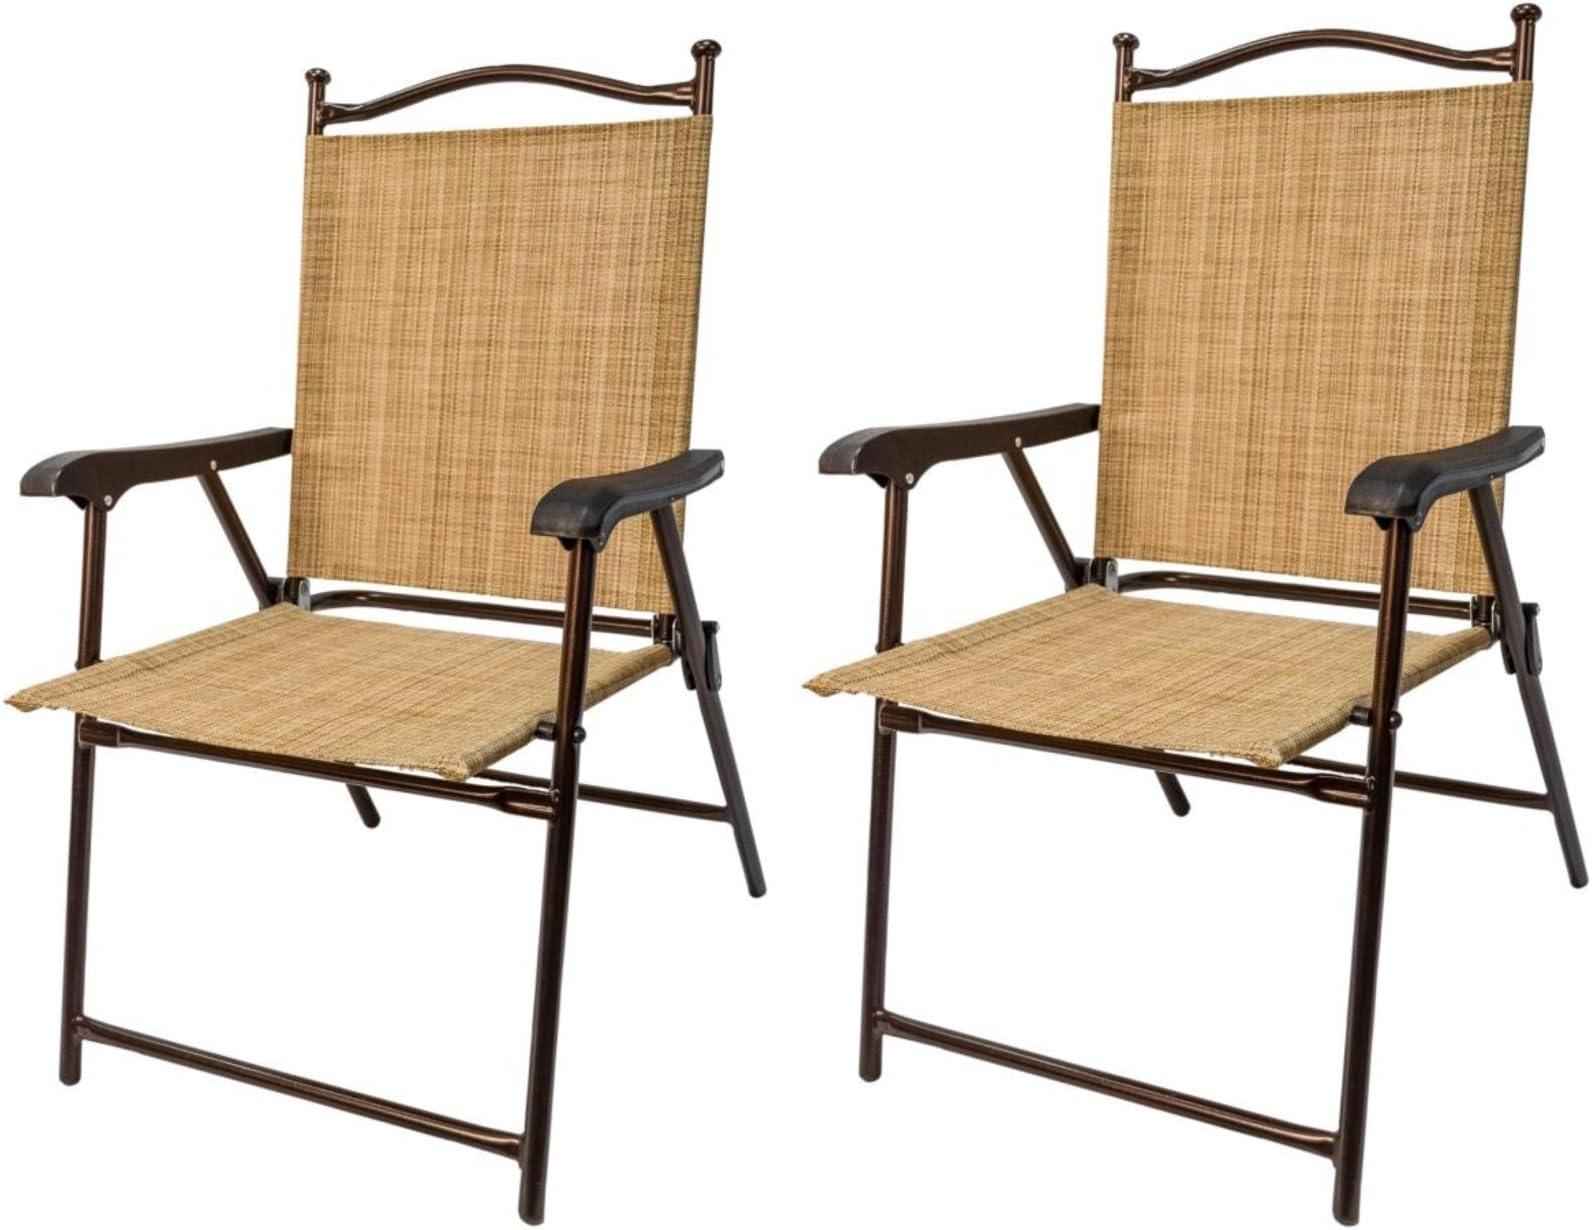 amazon com sling chairs patio lawn garden rh amazon com